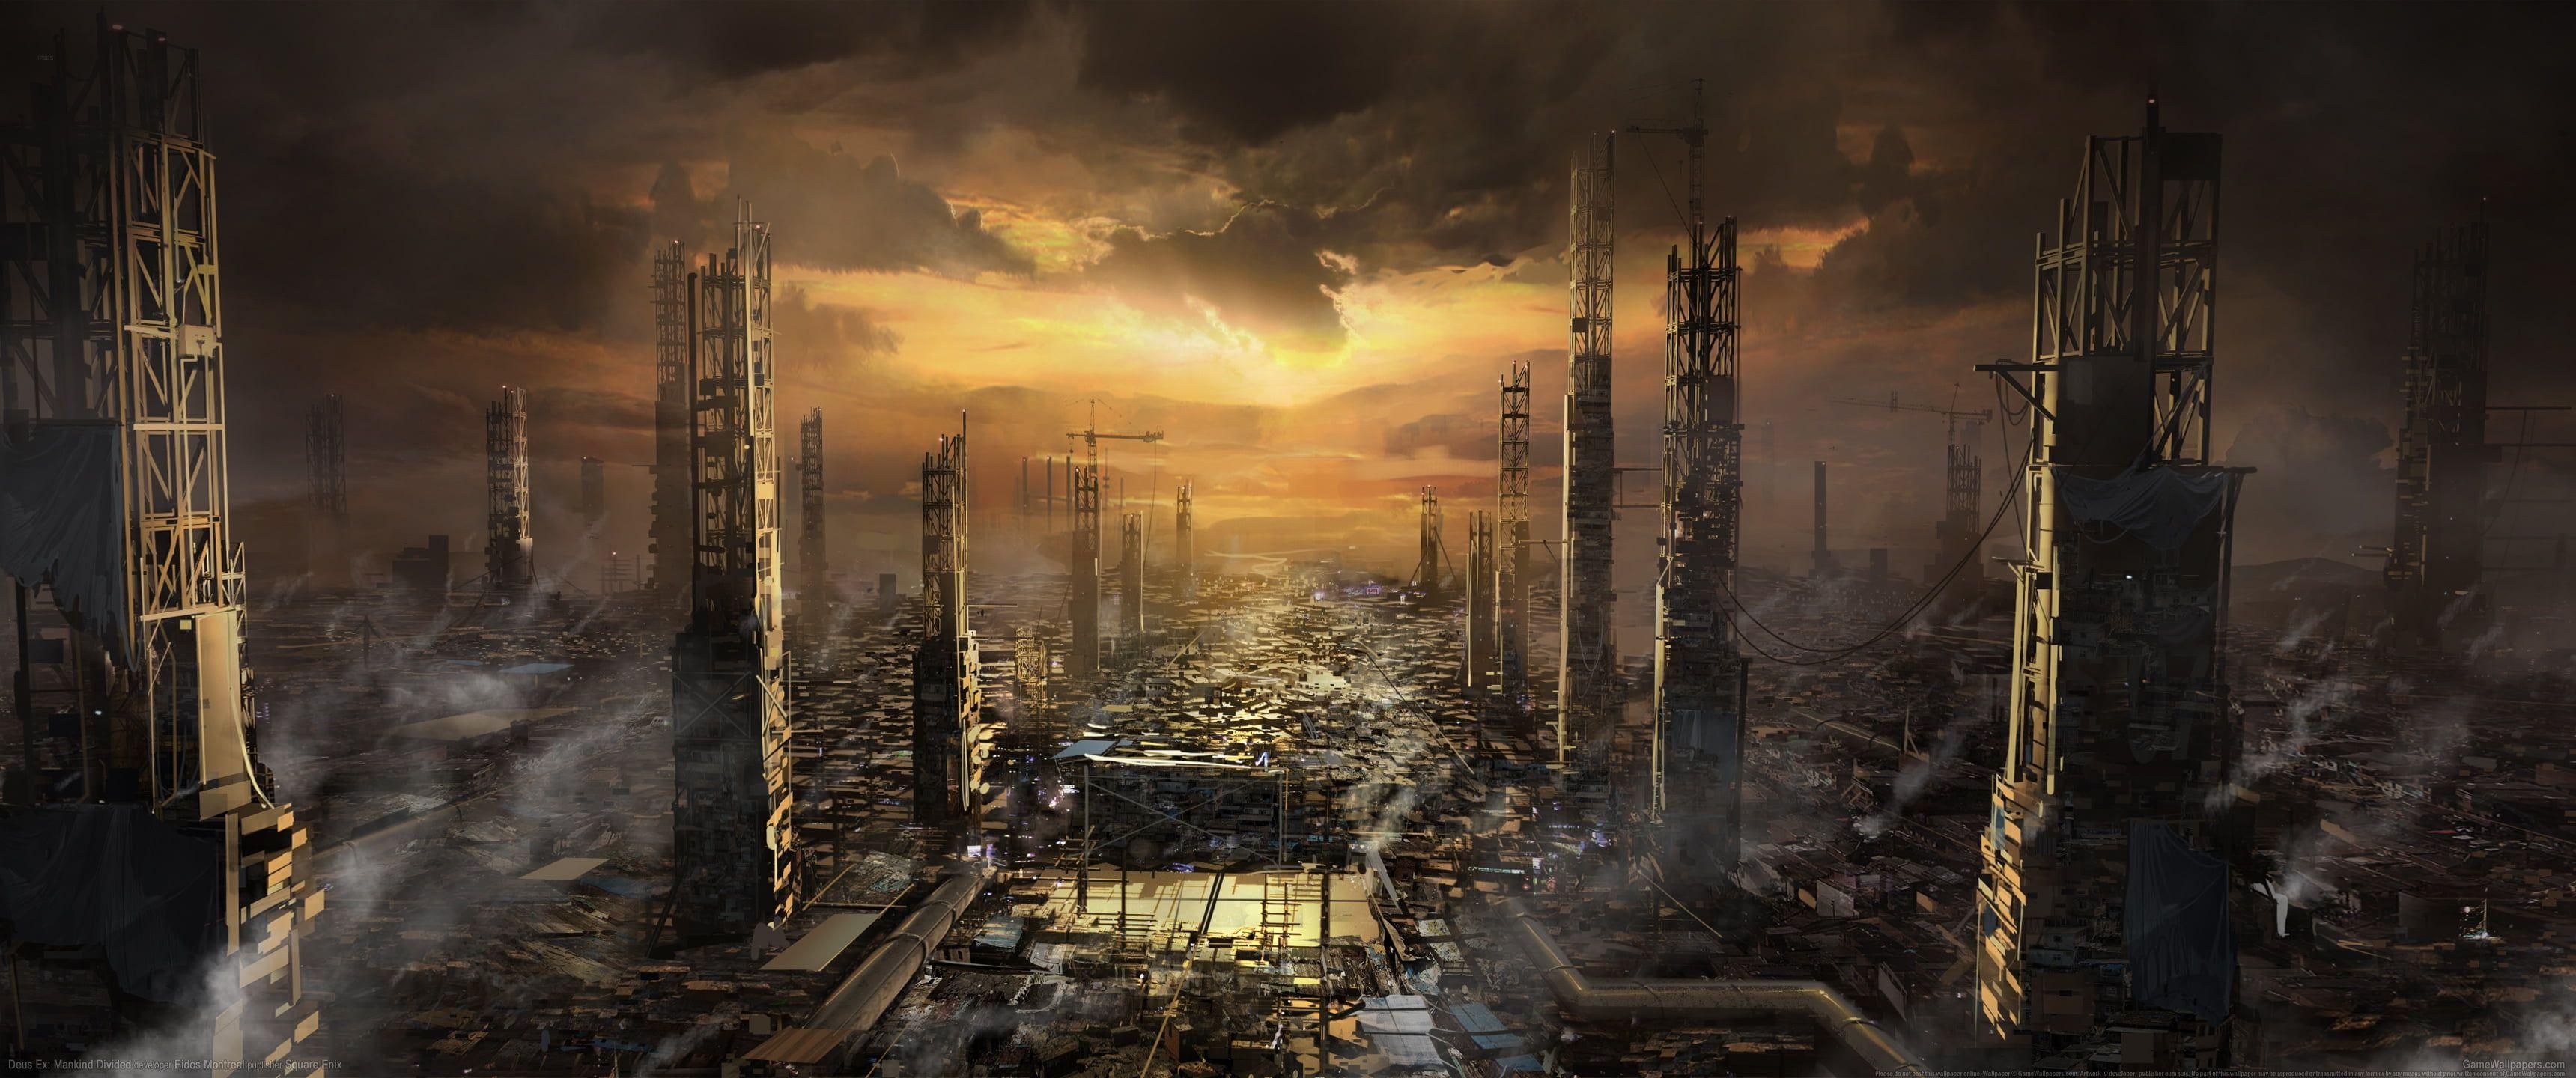 Video Games Ultrawide Ultra Wide Deus Ex Mankind Divided Cyberpunk Video Game Art Deus Ex 2k Wallpaper Hdwal Deus Ex Deus Ex Mankind Divided Concept Art